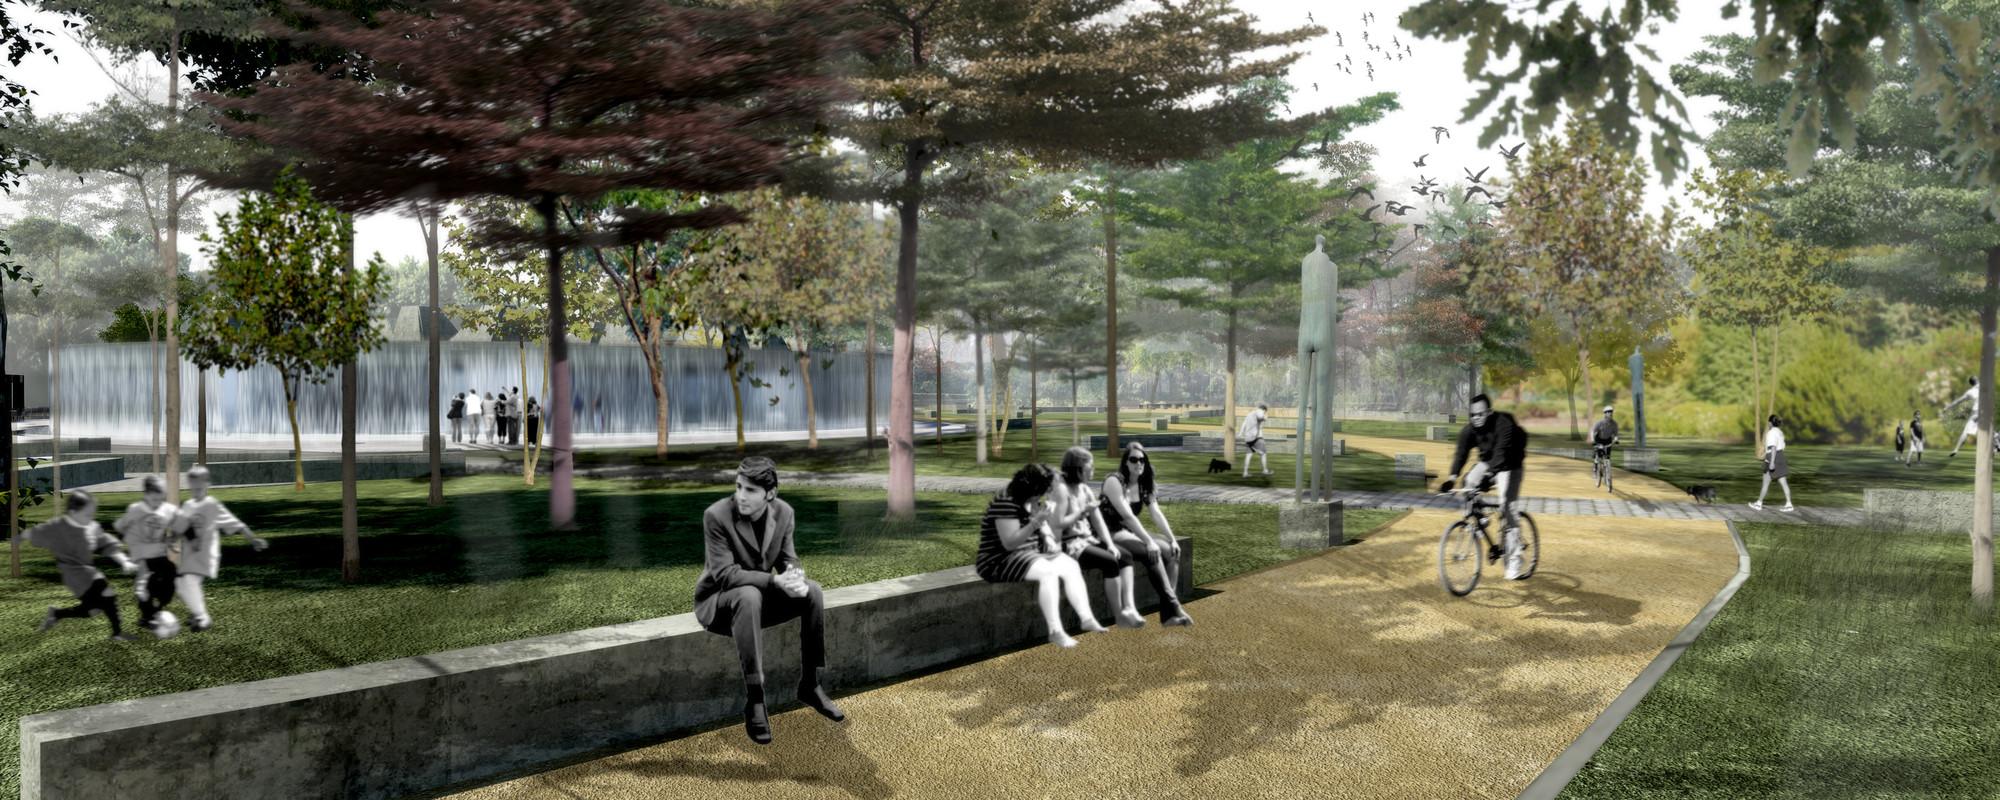 Parque. Image Cortesia de Gerardo Valle P. Arquitectos Asociados + Winckler Arquitectos Asociados